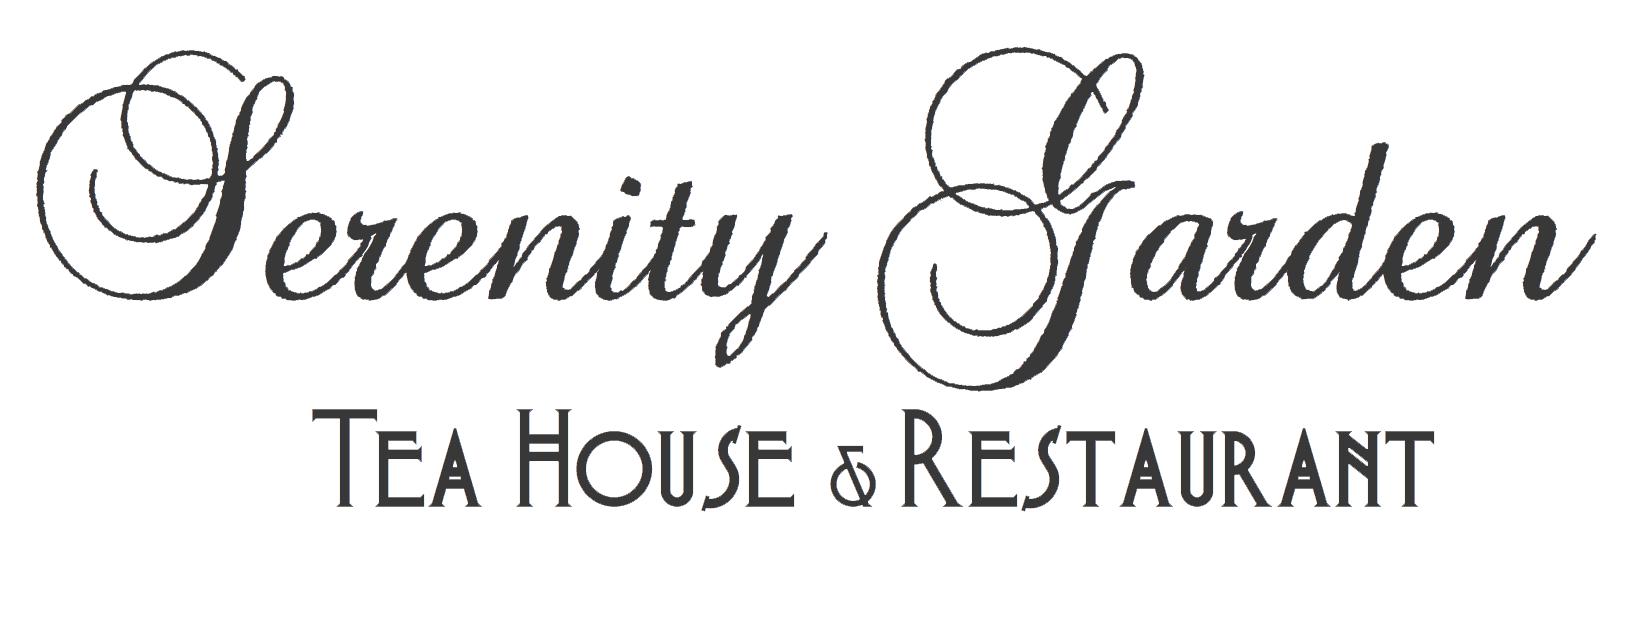 serenity garden logo